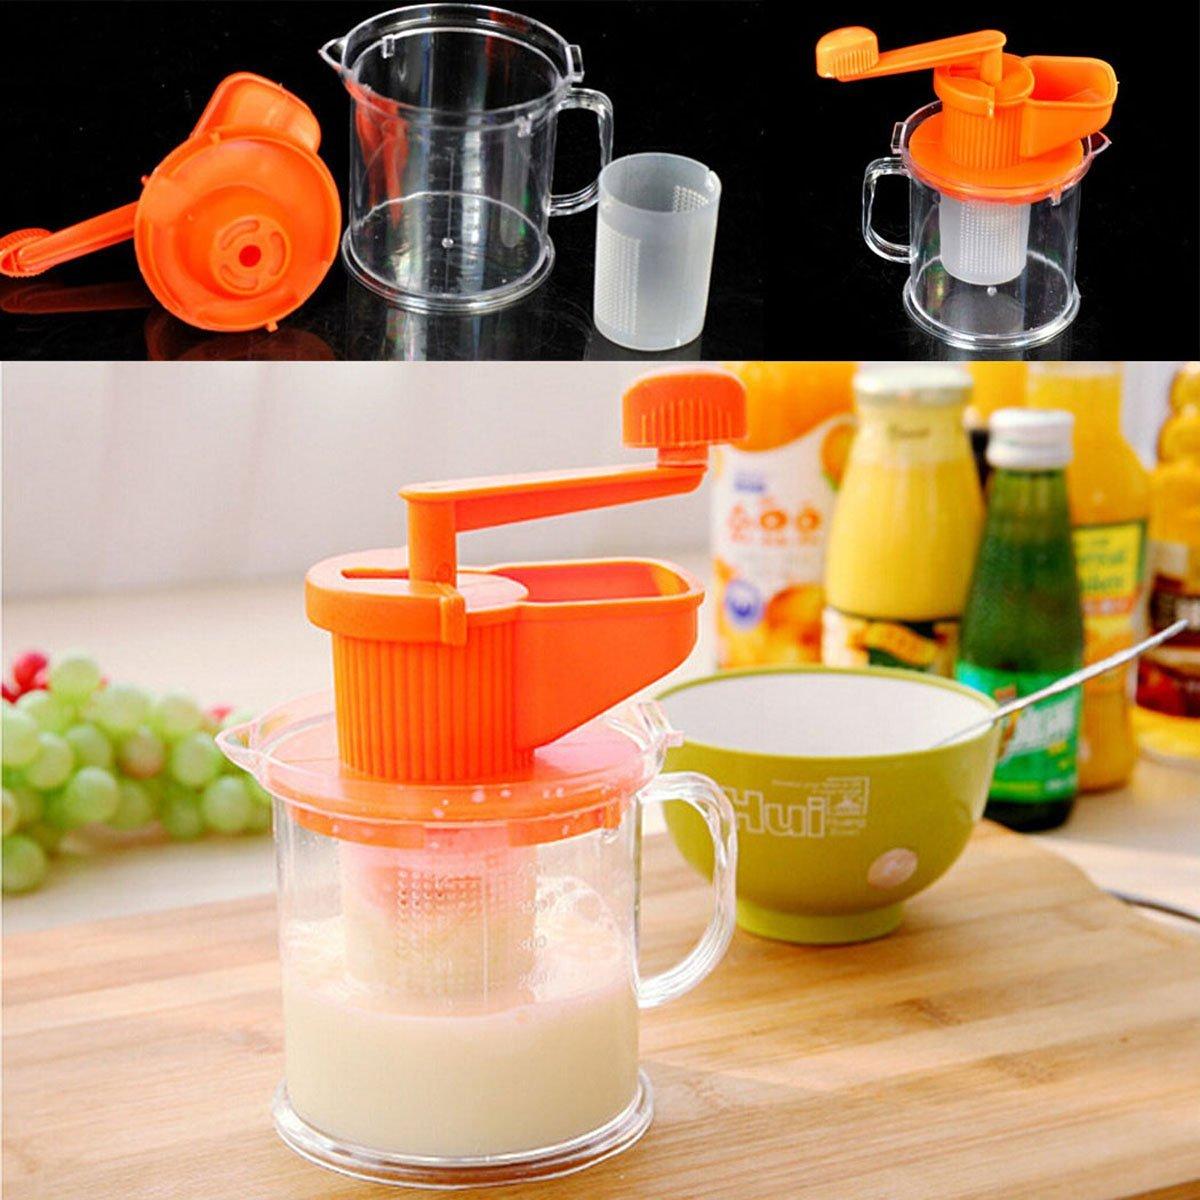 boutique1583 Kitchen Manual Soybean Milk Maker Fruit Juicer Extractor